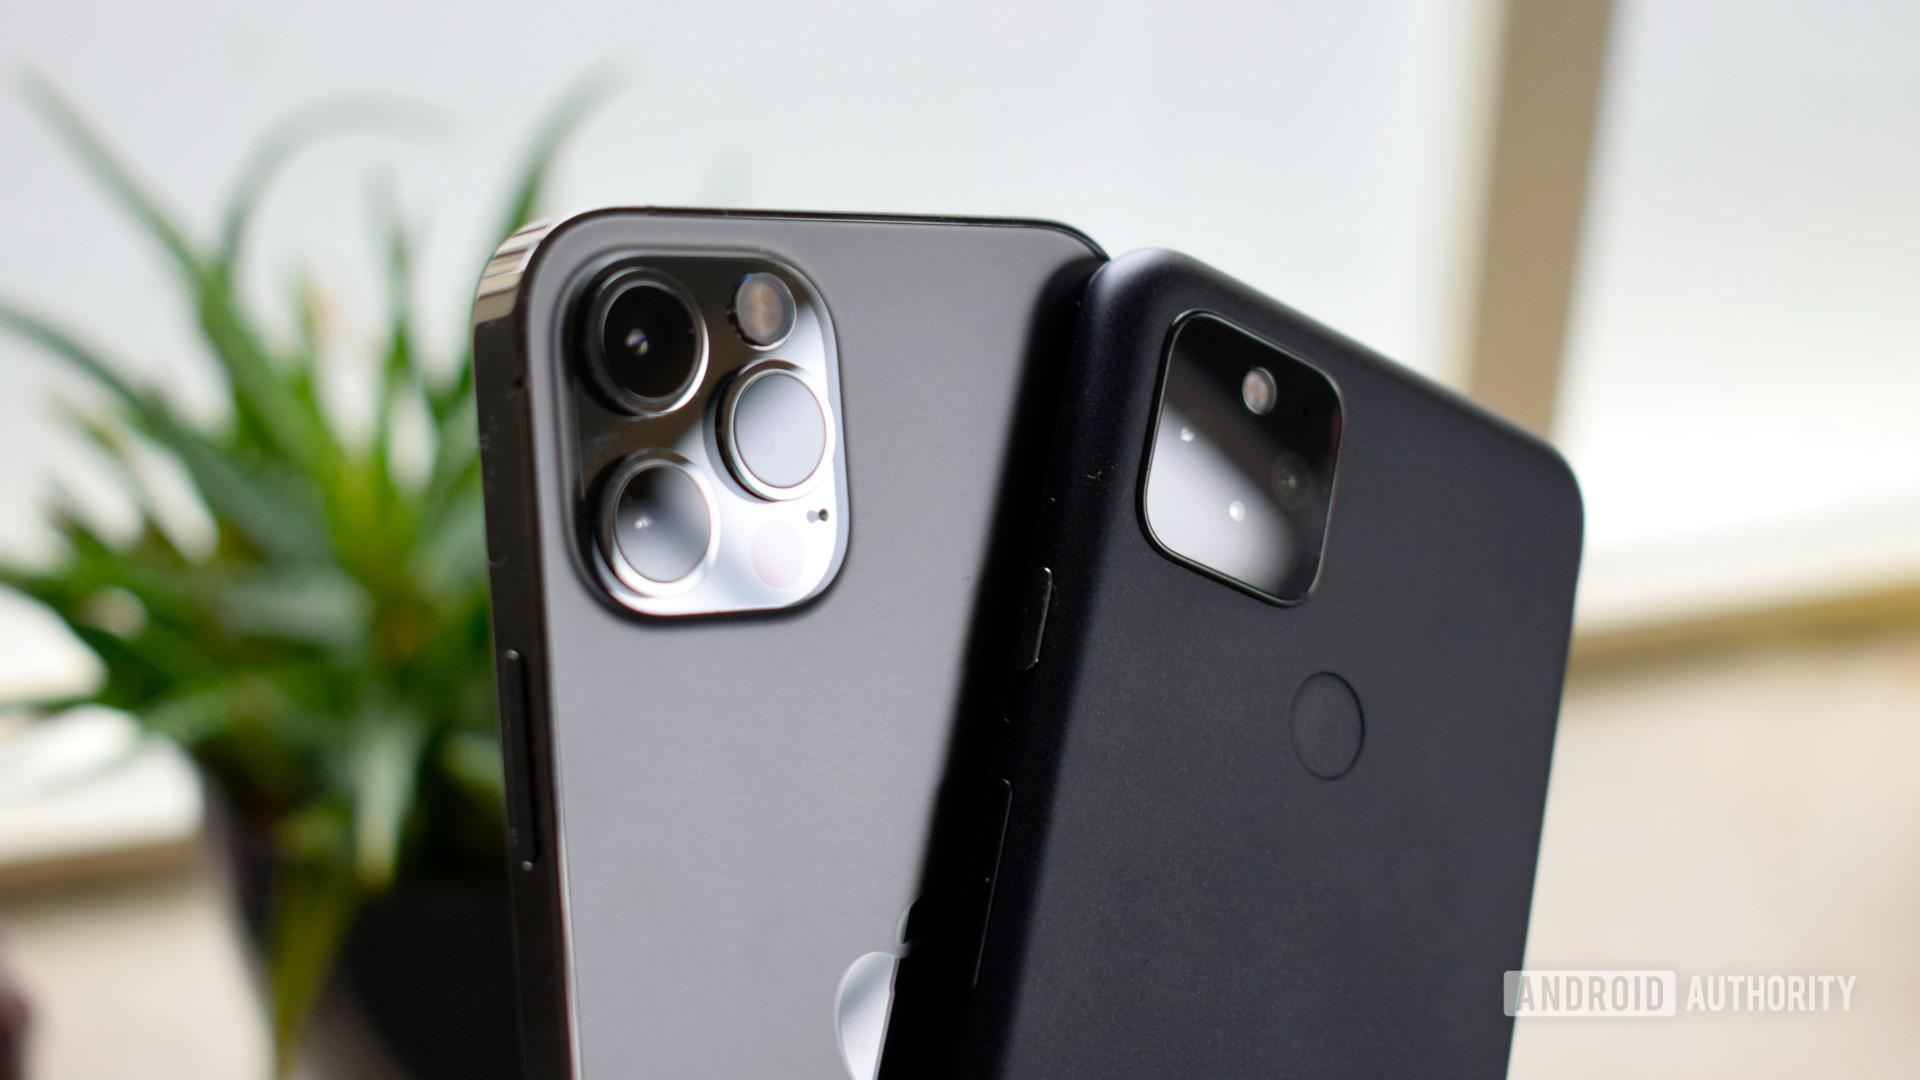 Google Pixel 5 vs Apple iPhone 12 Pro cameras side by side.